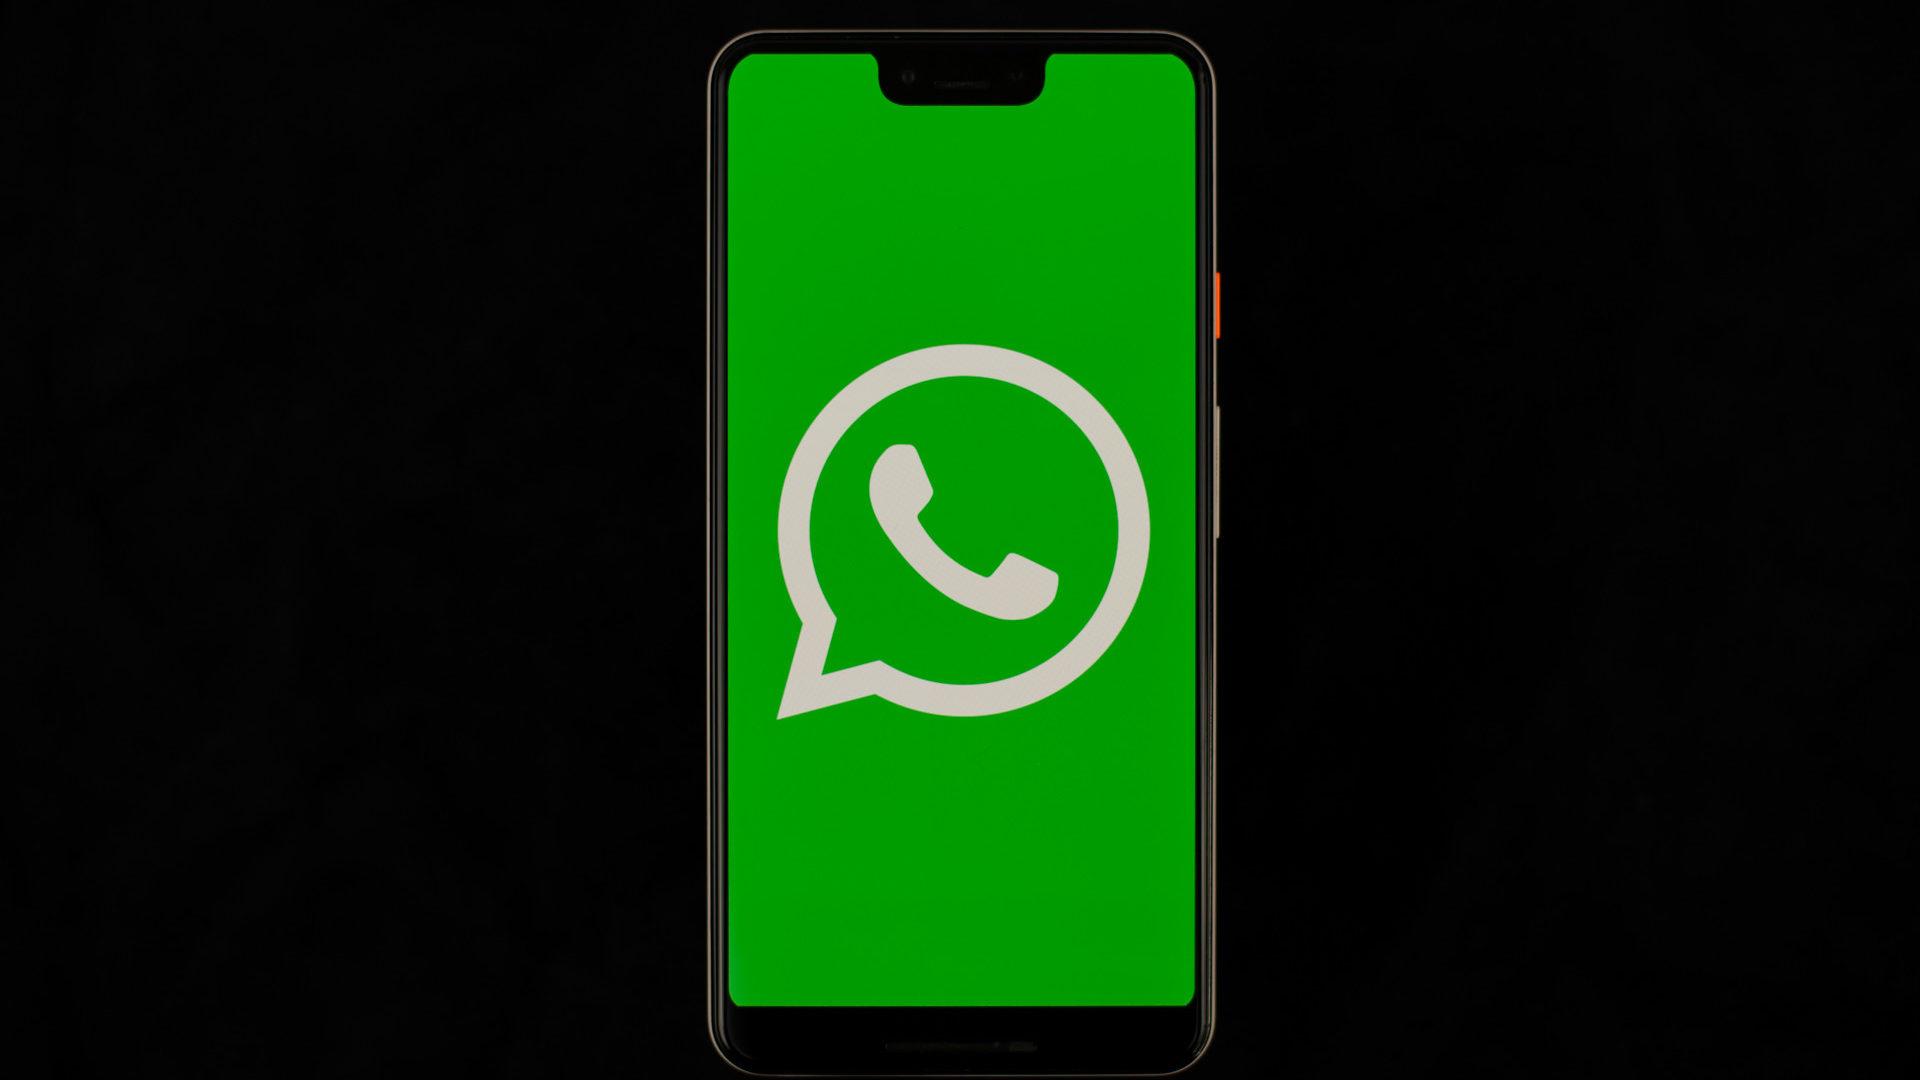 What is Whatsapp